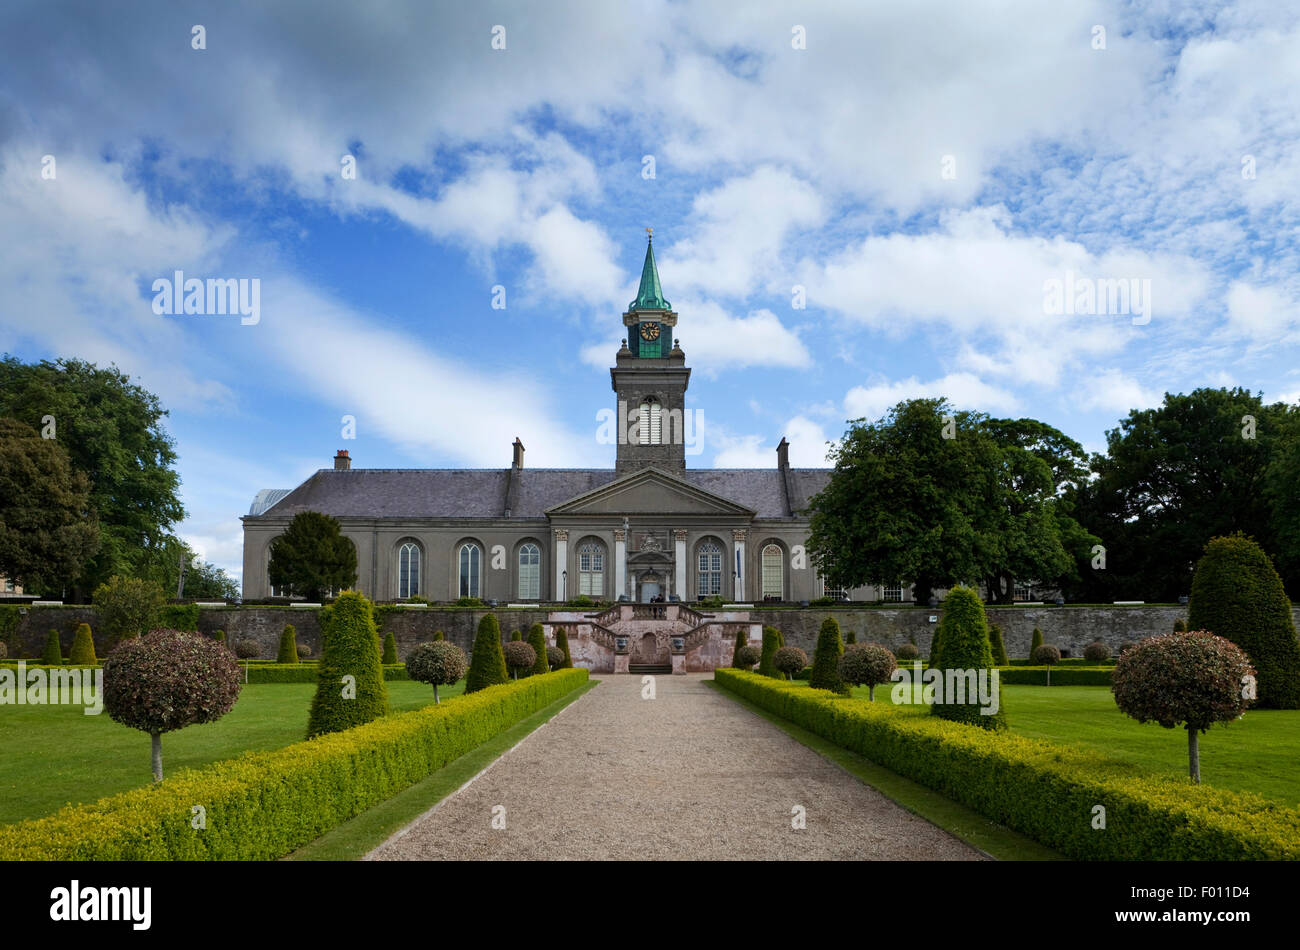 The renovated gardens in the grounds of the Royal Hospital, now the Irish Museum of Modern Art, Kilmainham, Dublin - Stock Image